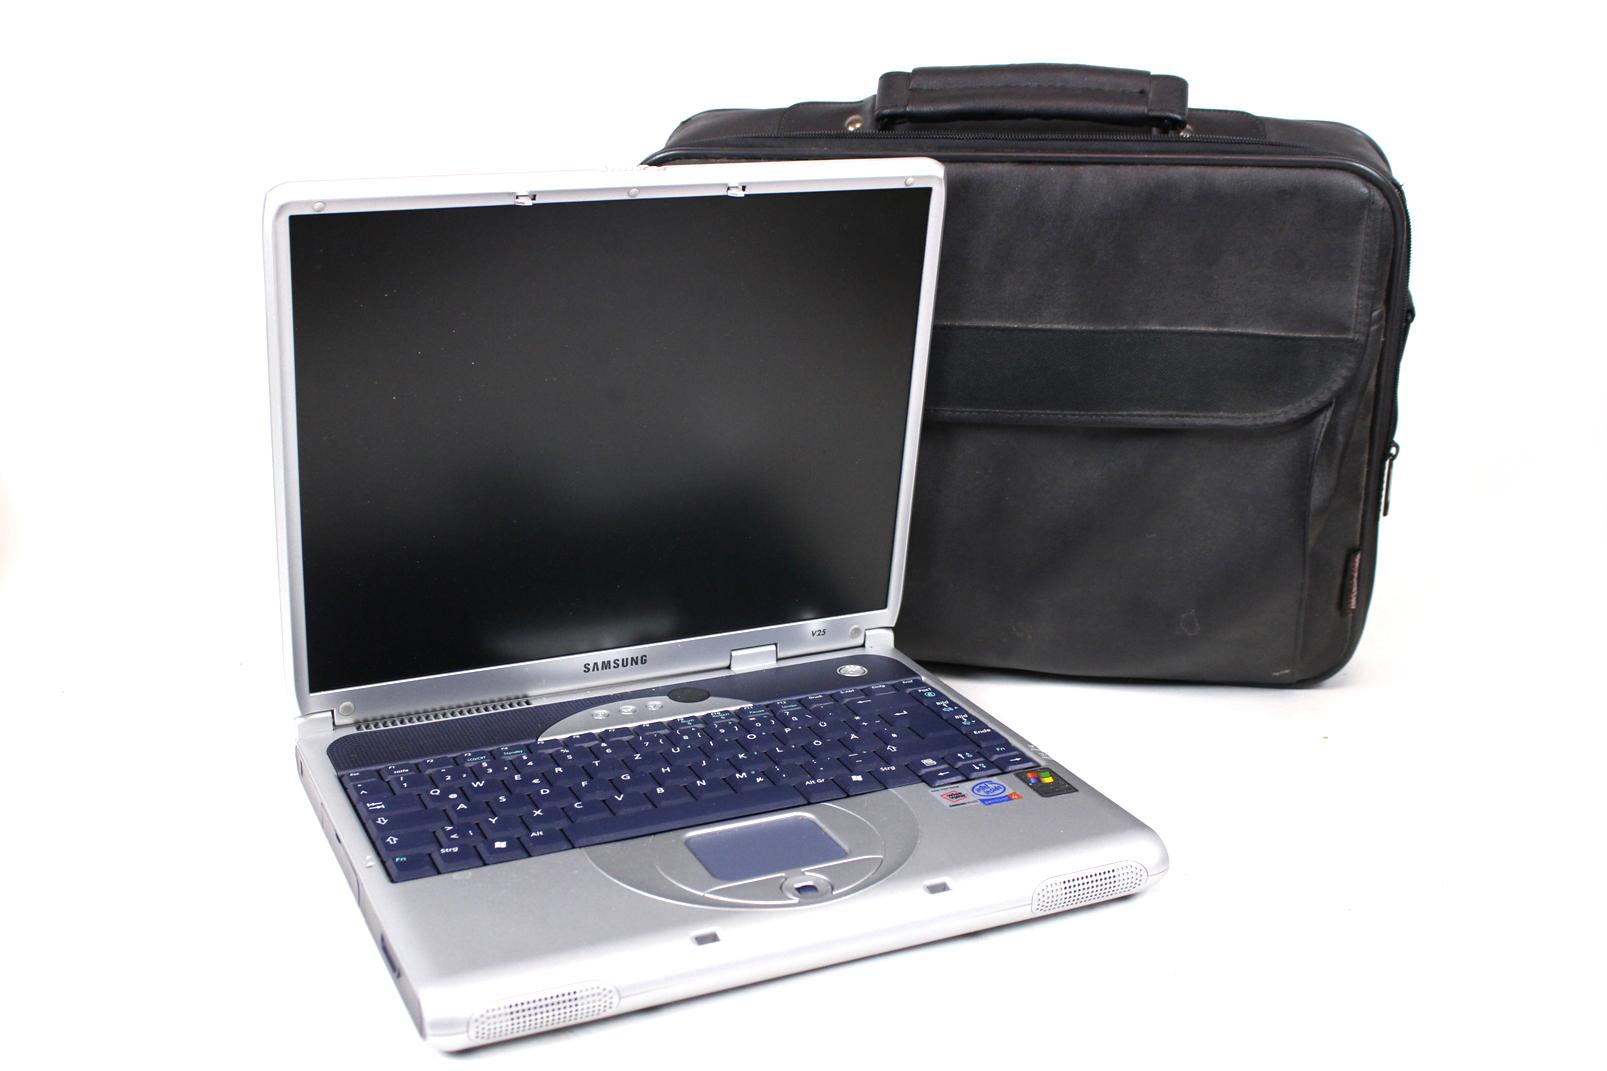 samsung v25 notebook intel pentium 4 ghz cpu 512 mb ram dvd multi laptop ebay. Black Bedroom Furniture Sets. Home Design Ideas